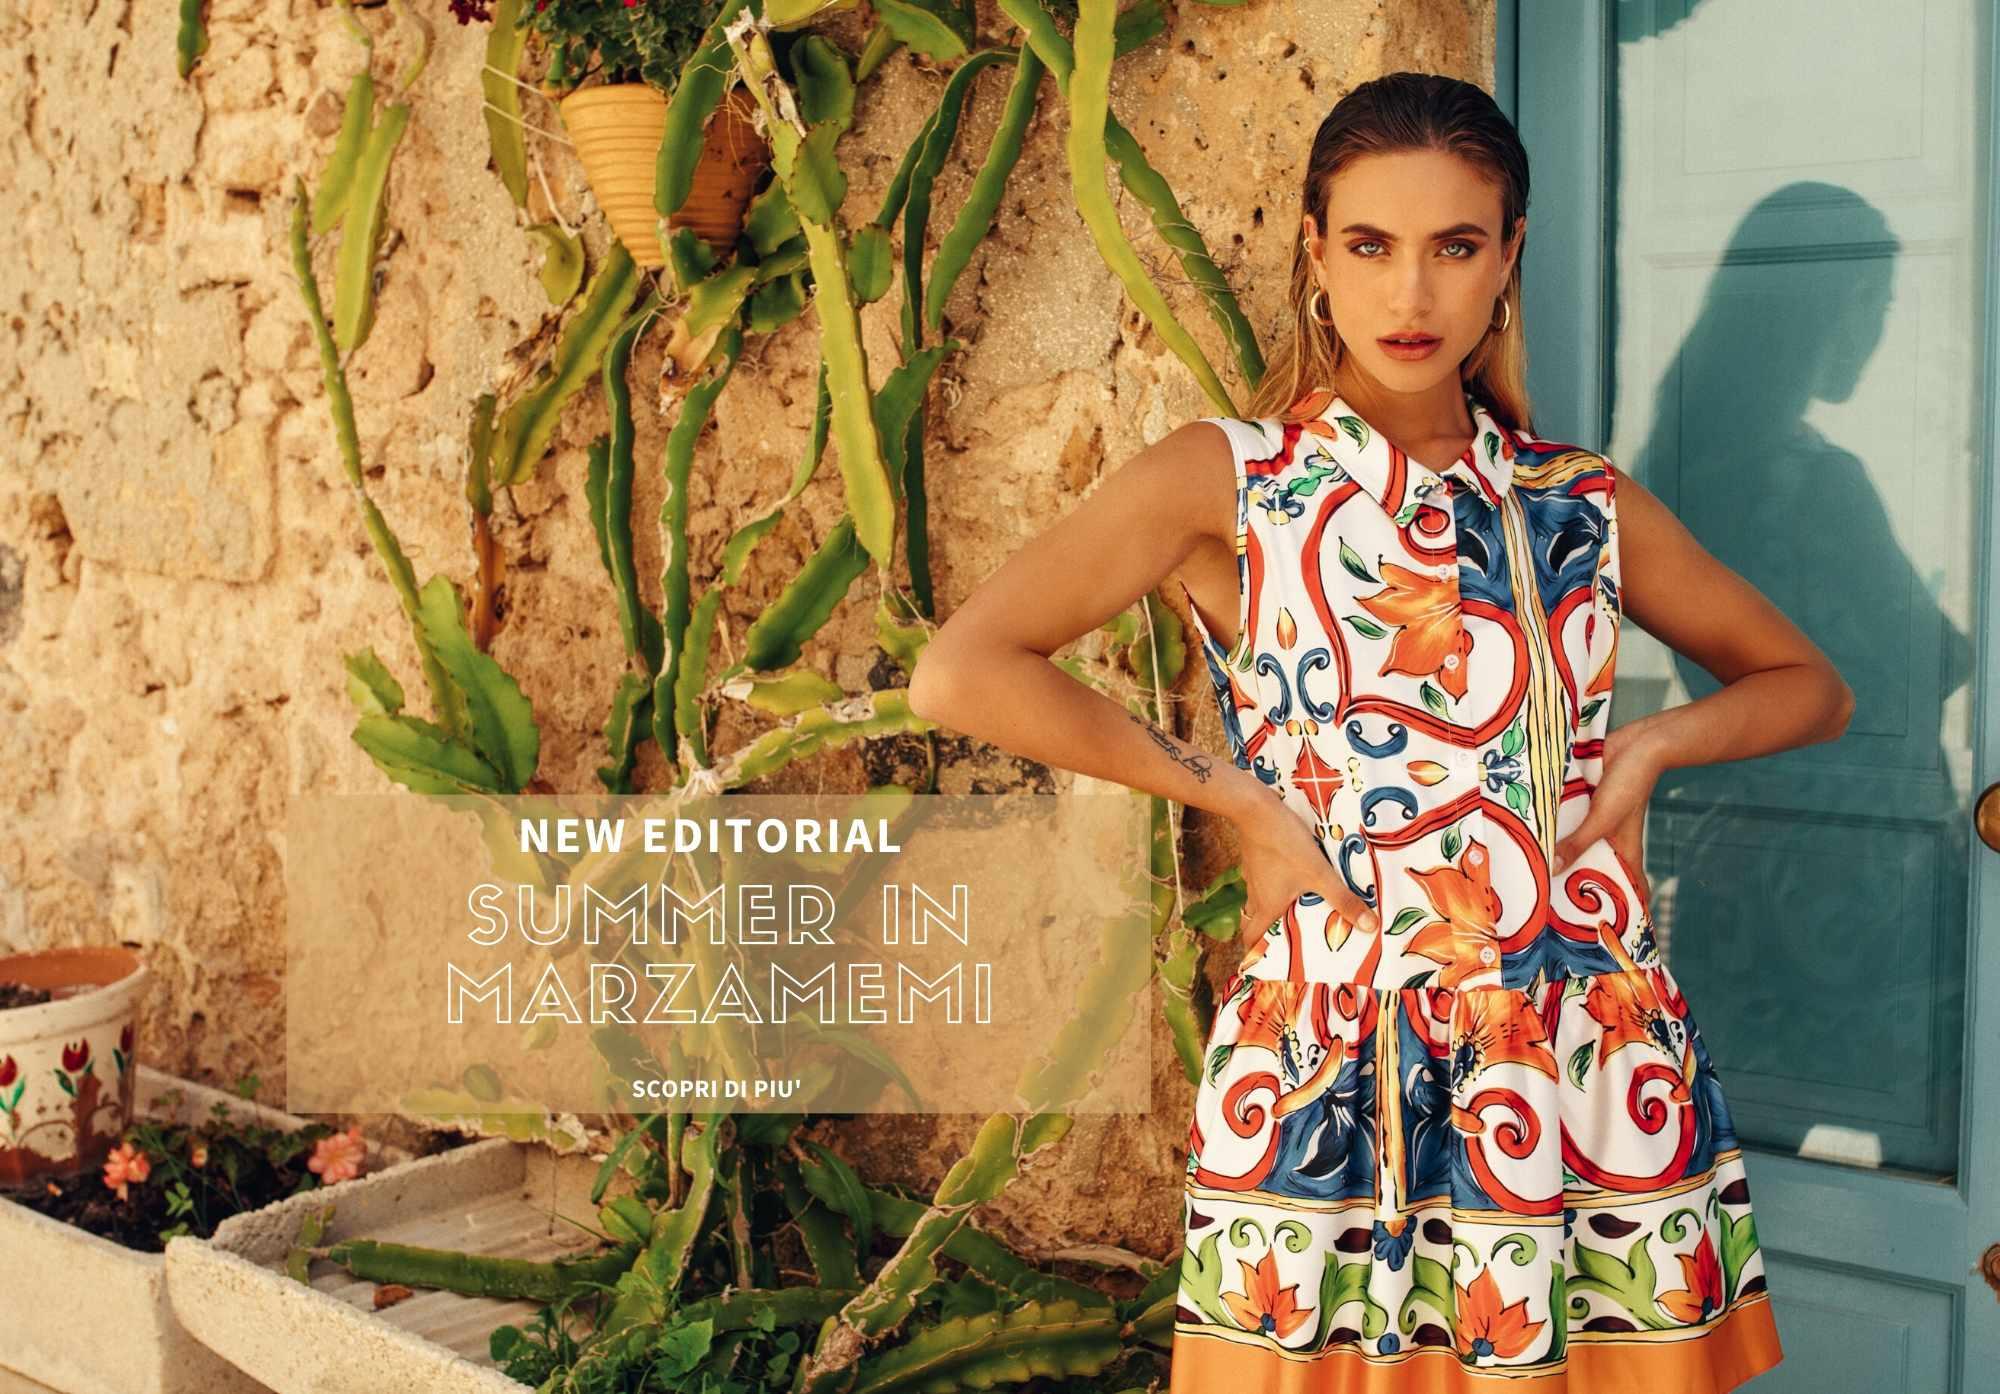 Futur3 Fashion | Summer in Mazmamemi Editorial